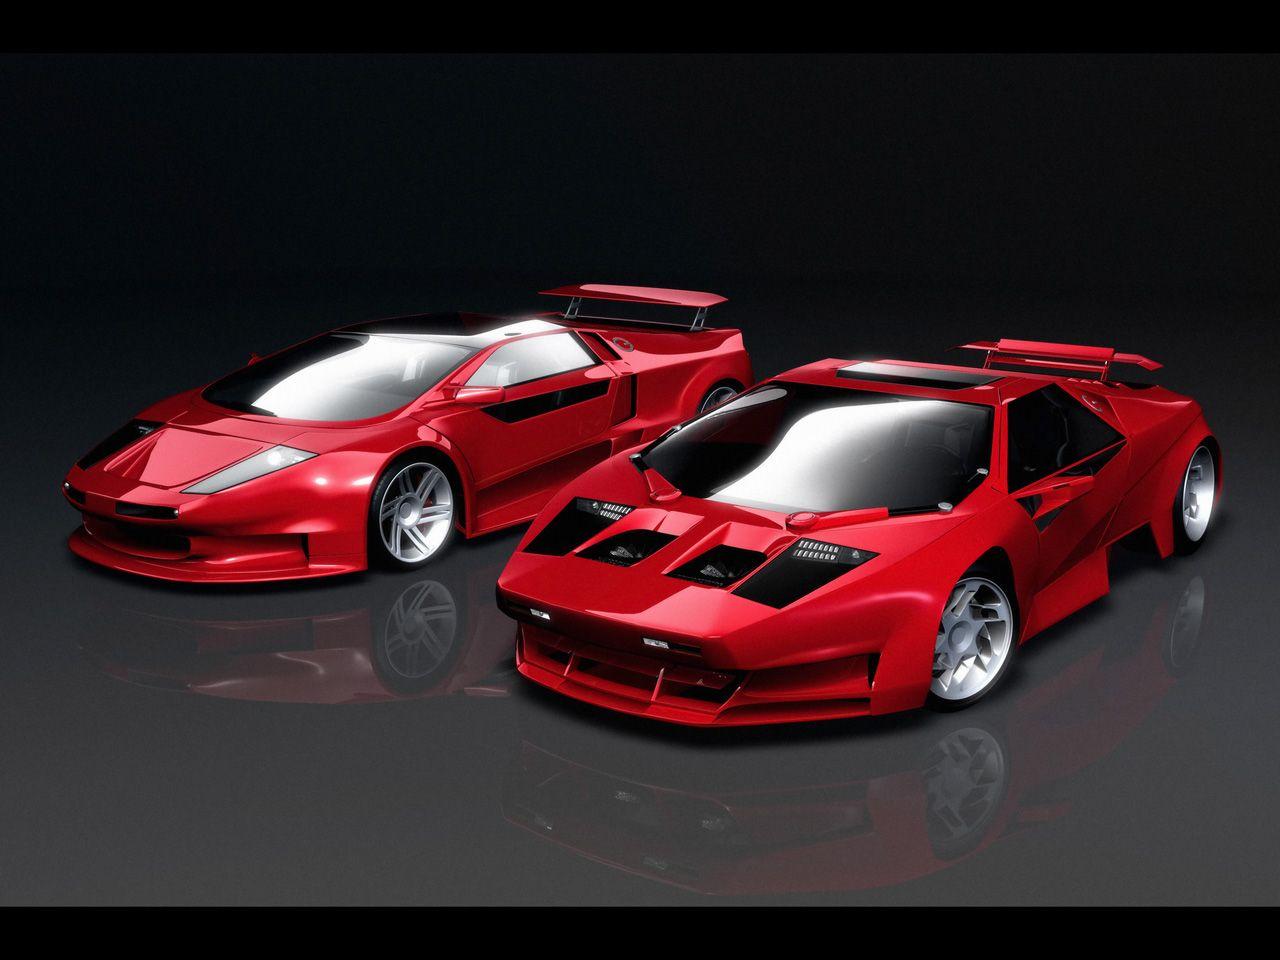 Vector Concept Design The Lotus Cars Community In 2020 Concept Car Design Concept Cars Super Cars